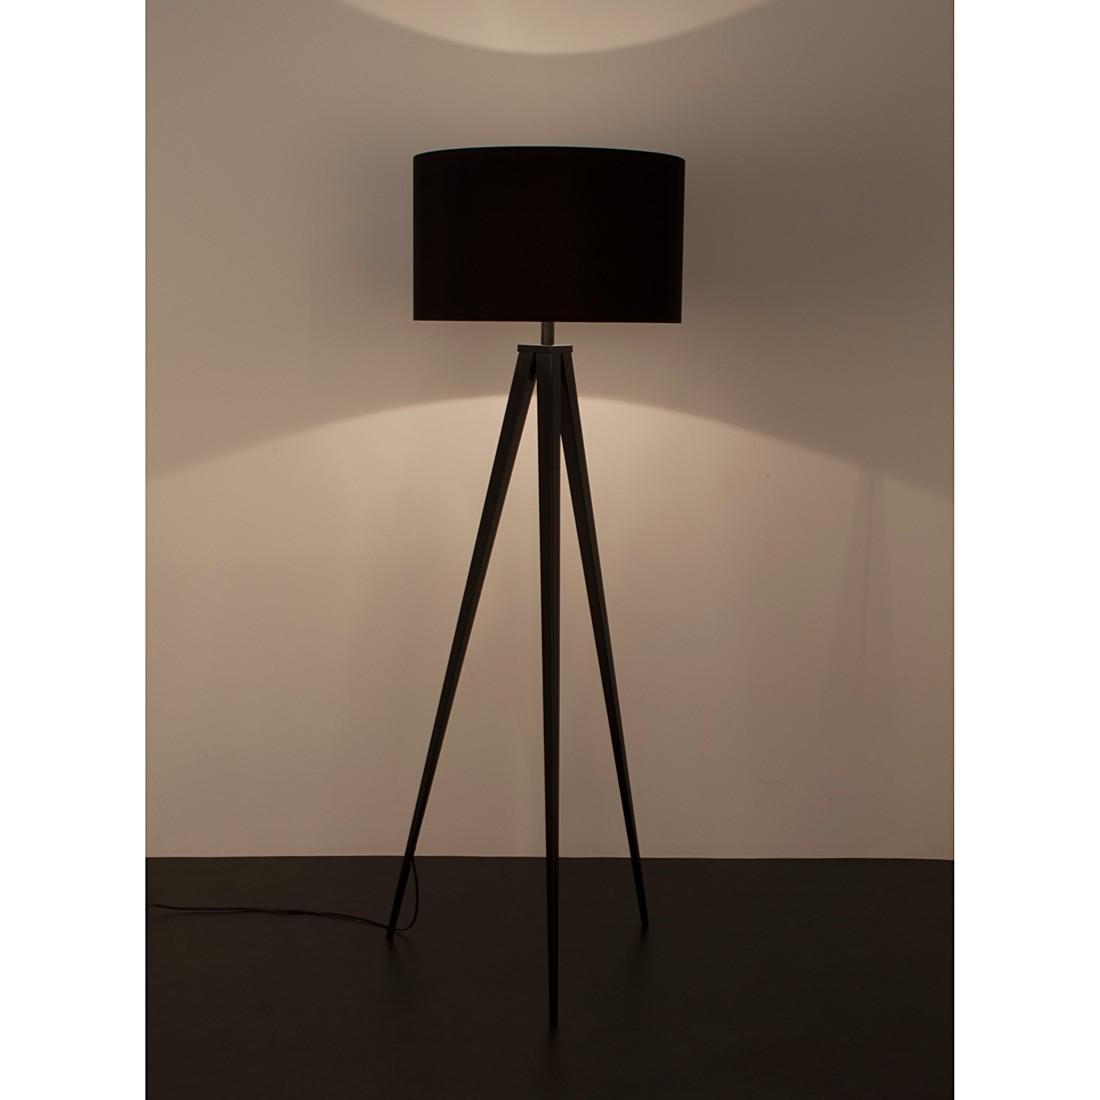 Stehlampe Wohnzimmer Holz | afdecker.com